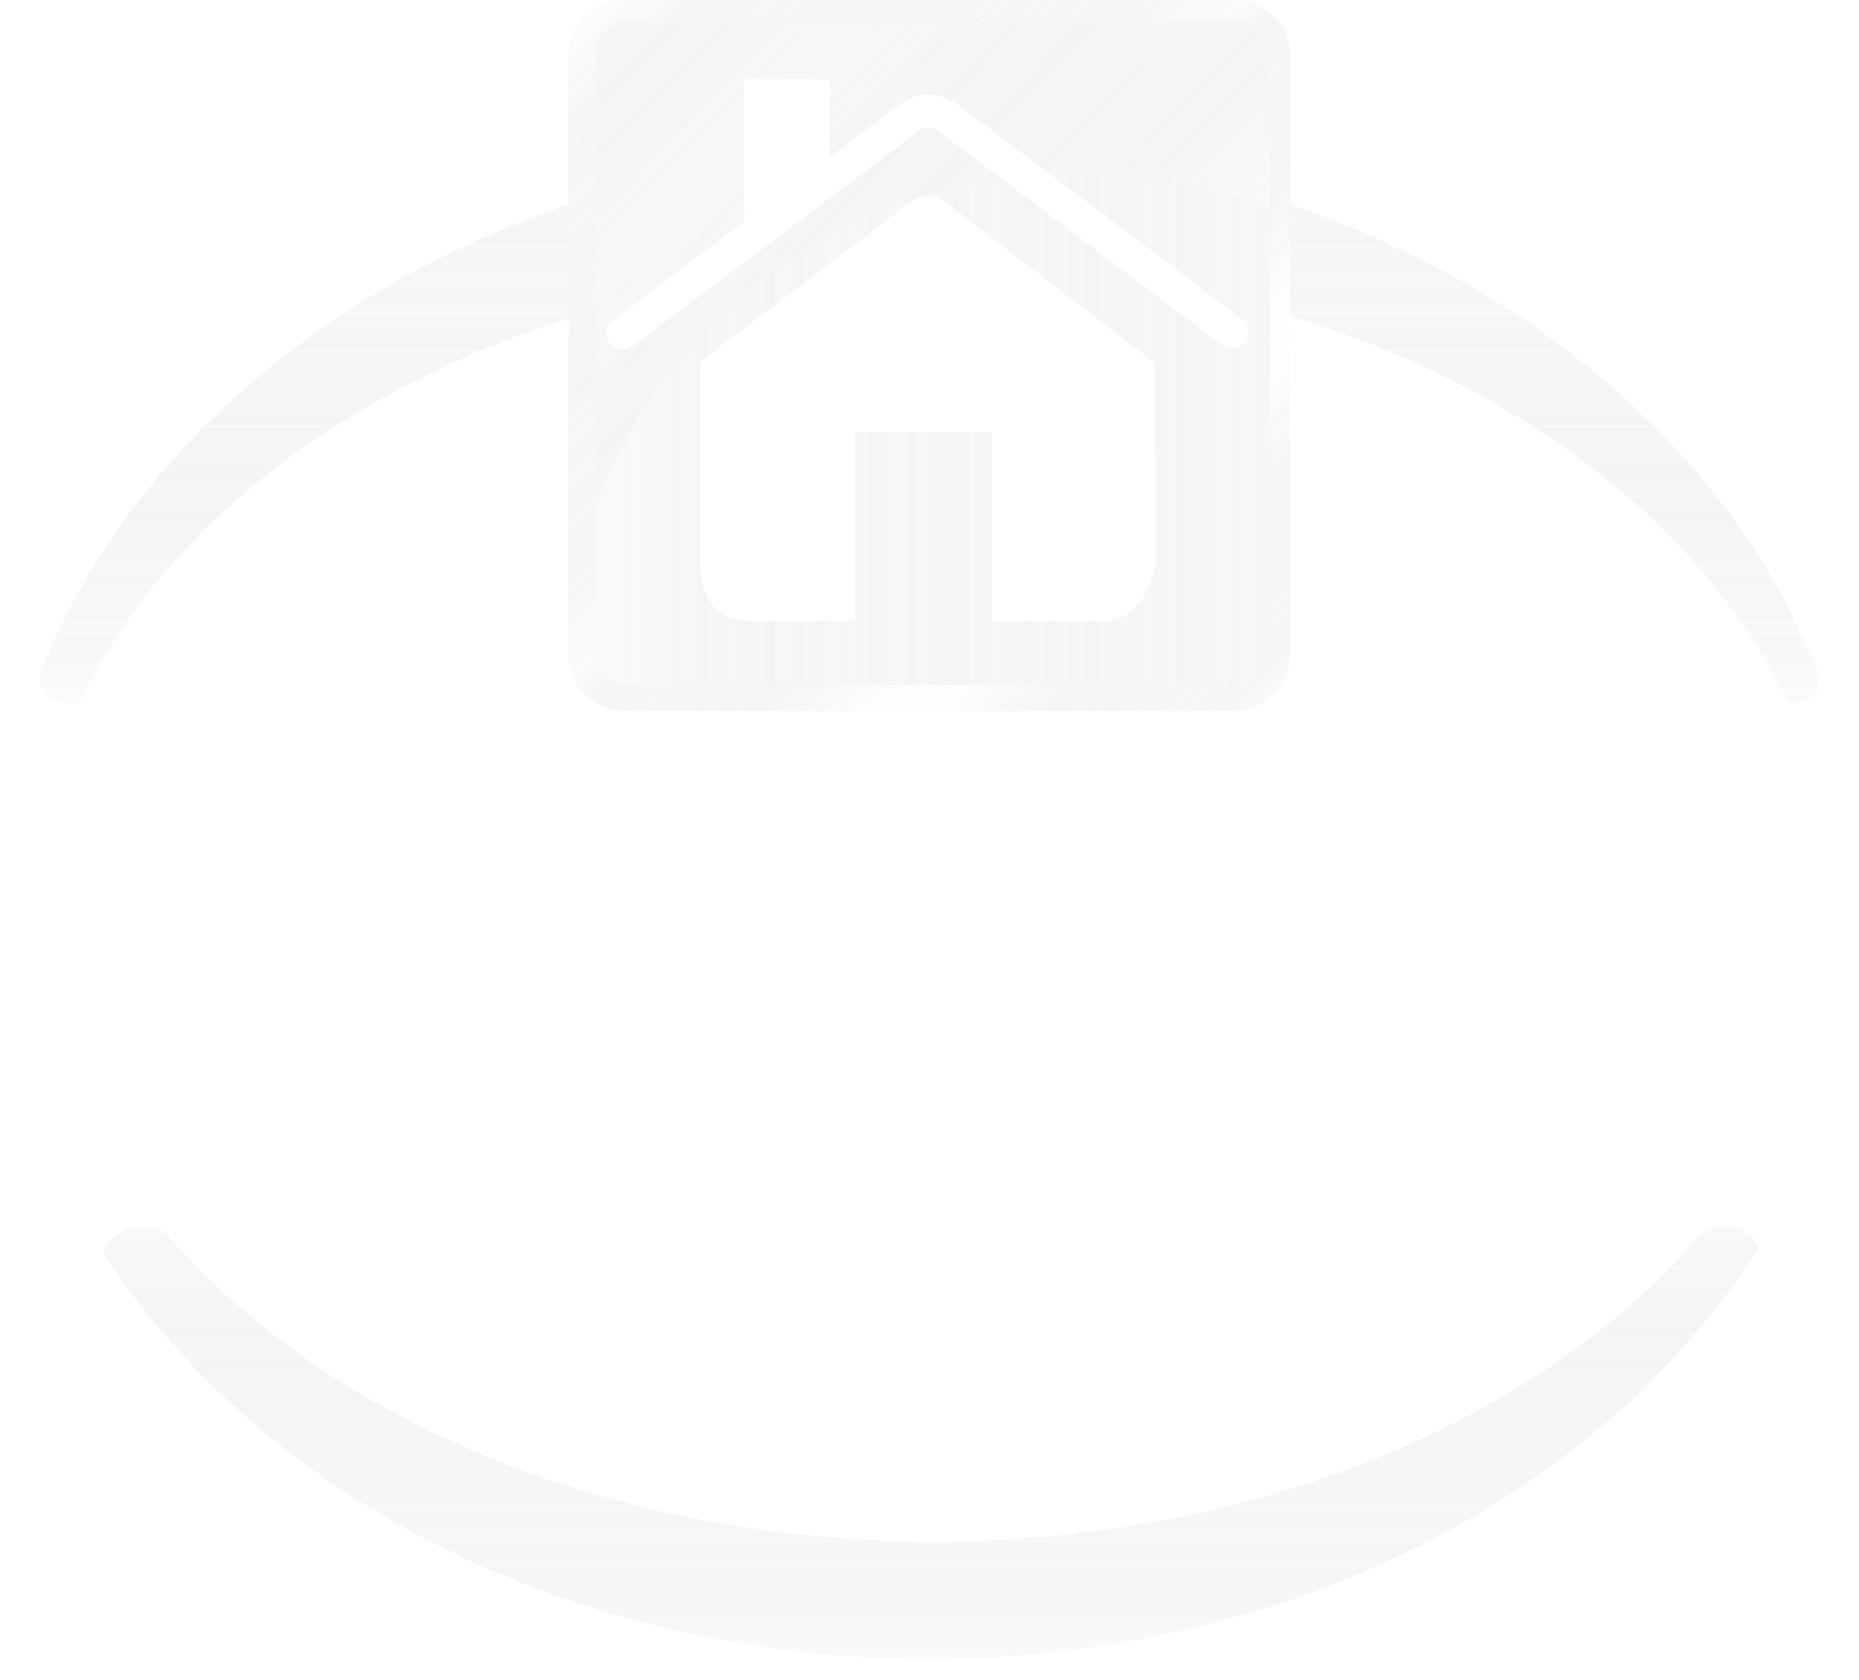 buyerslogo(w)